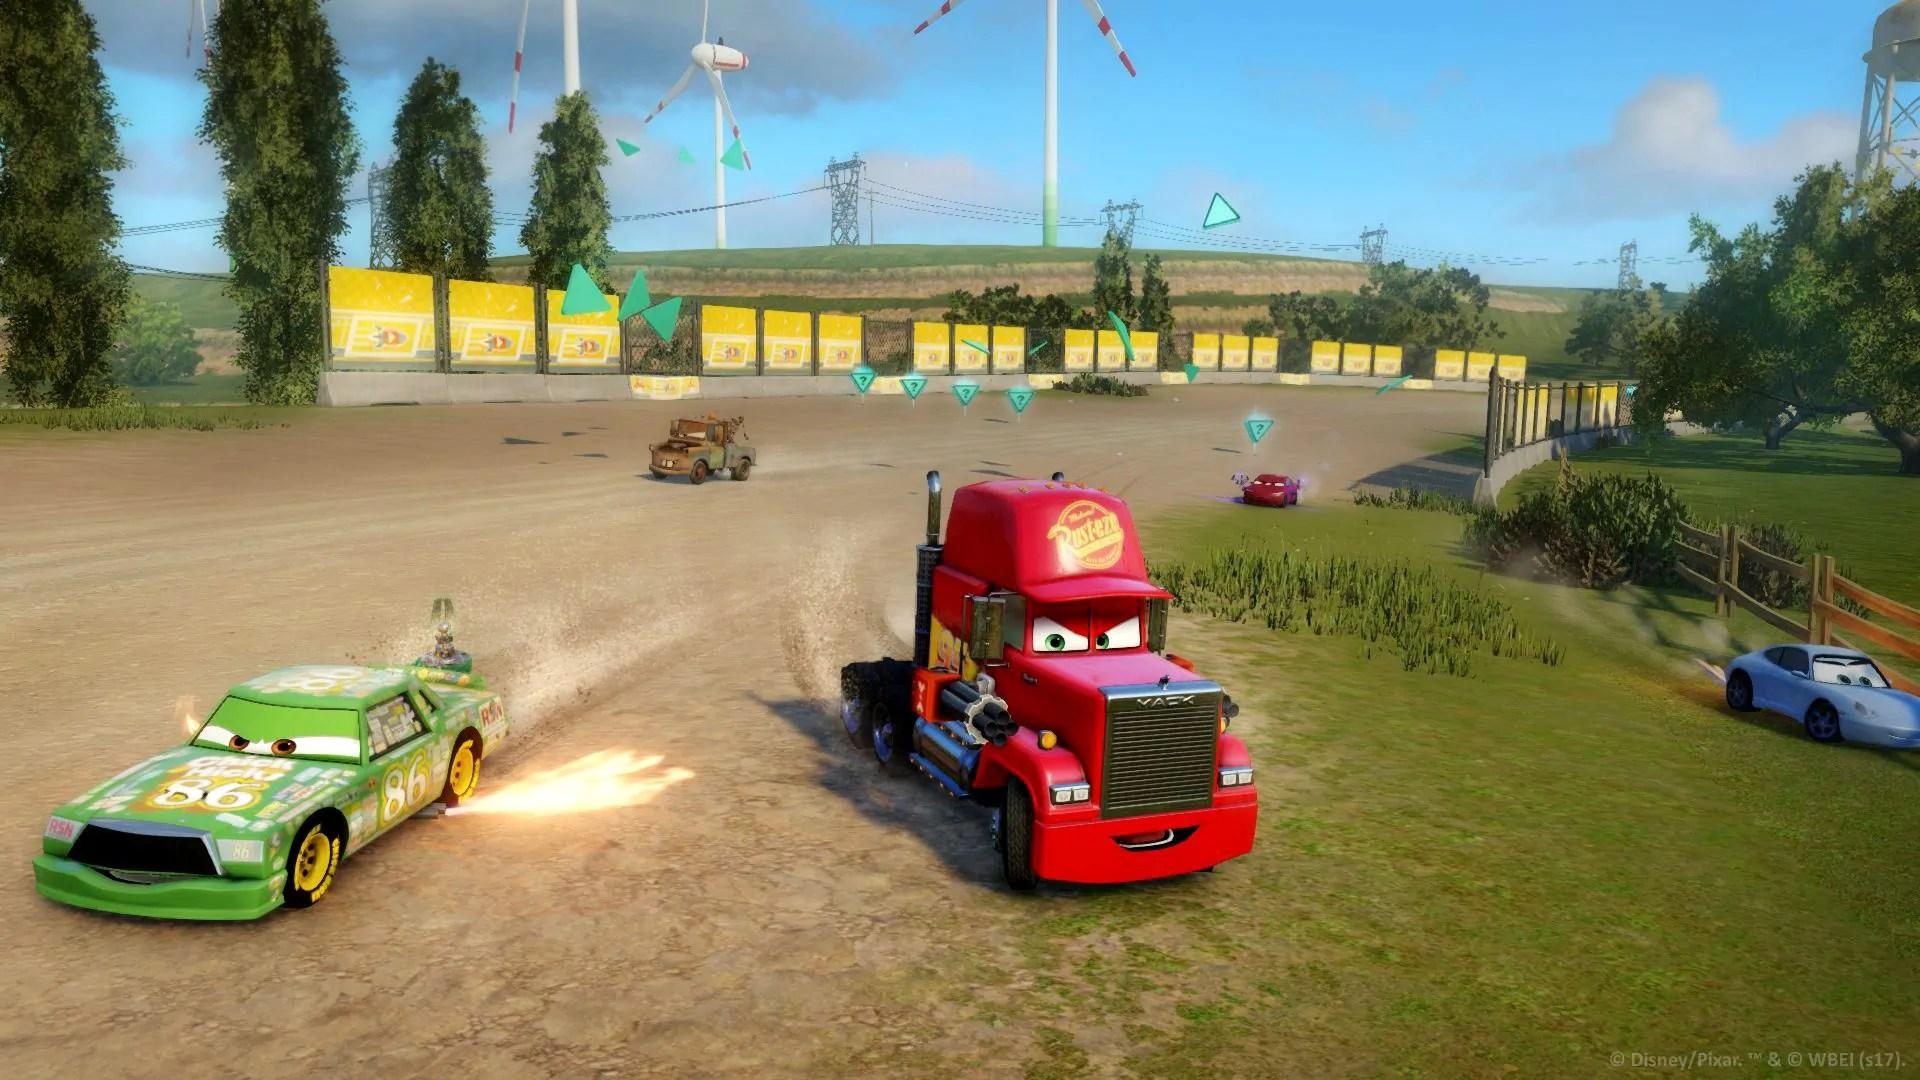 Cars 3: In gara per la vittoria, tutti in pista! 6